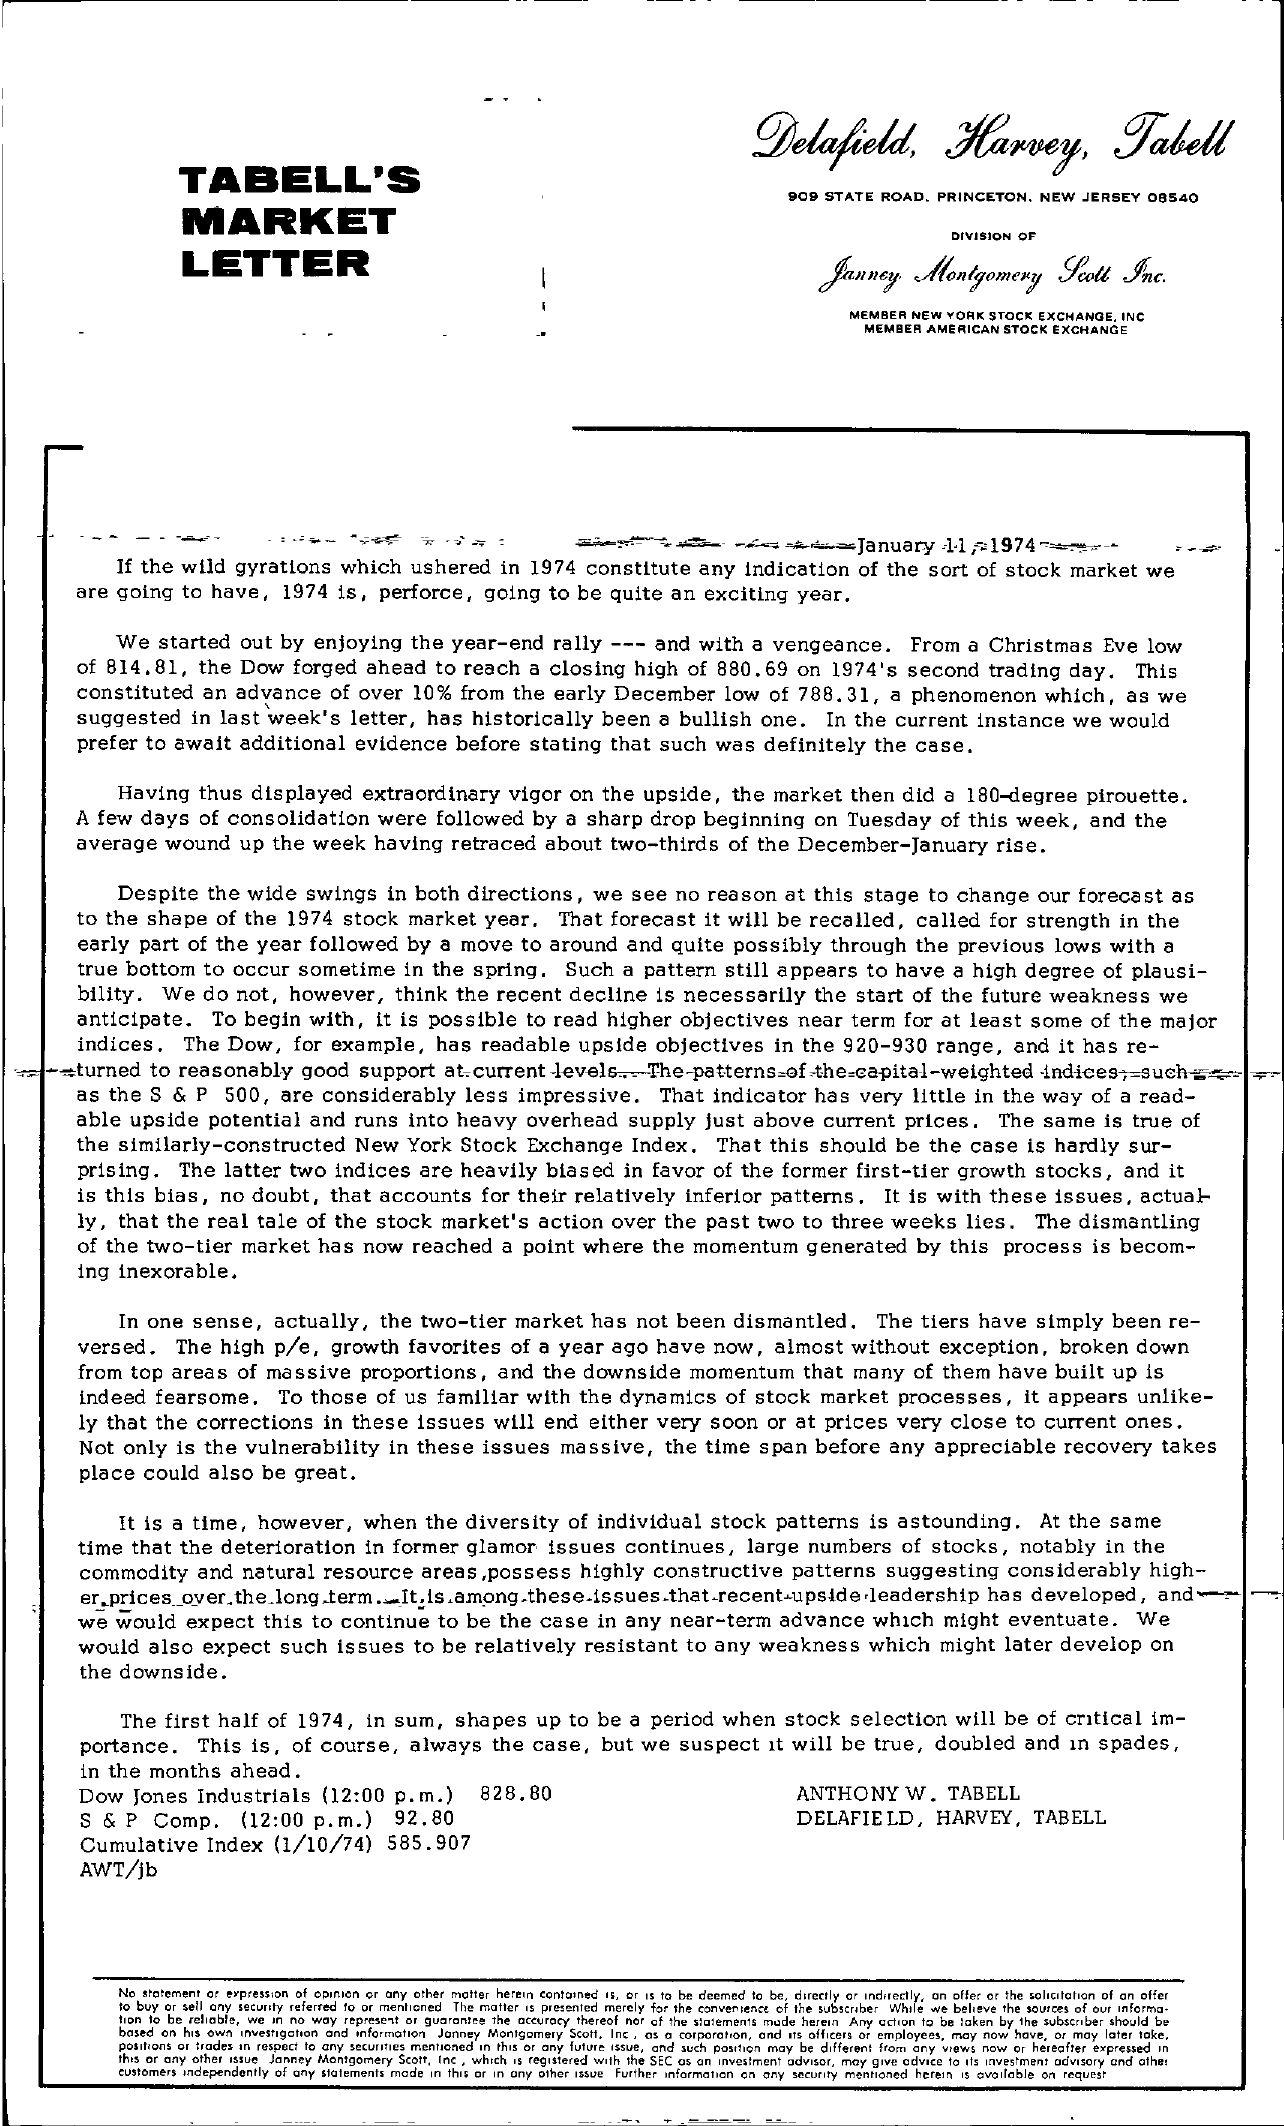 Tabell's Market Letter - January 11, 1974